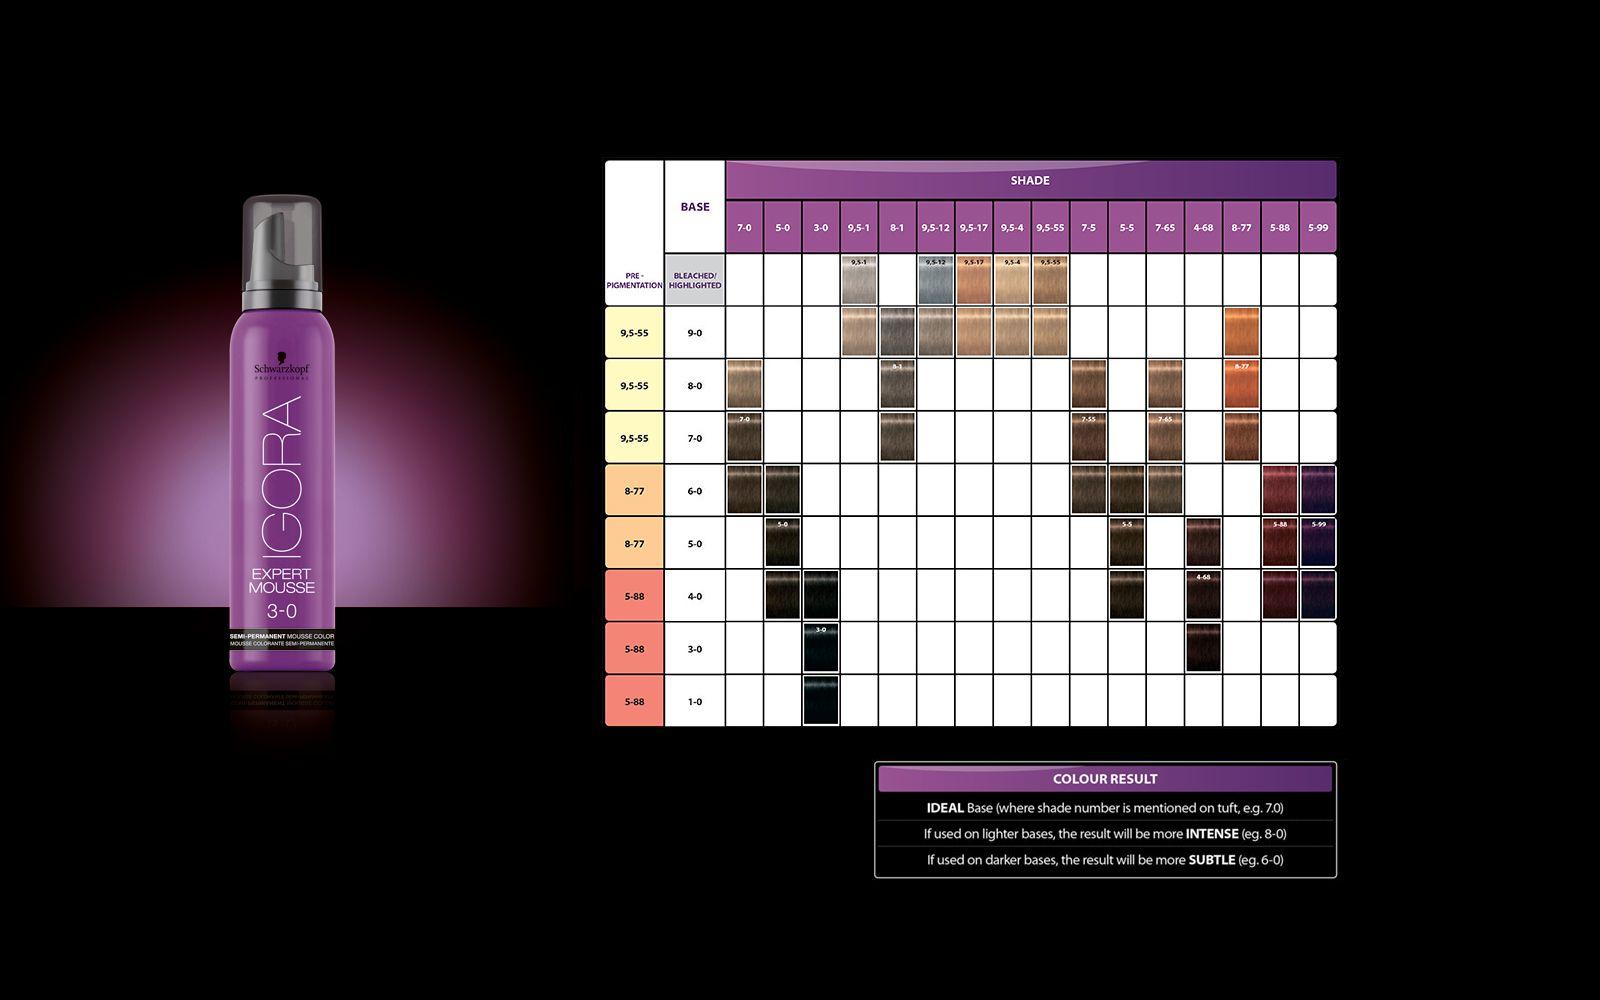 igora expert mousse color chart: Schwarzkopf professional igora expert mousse hair pinterest